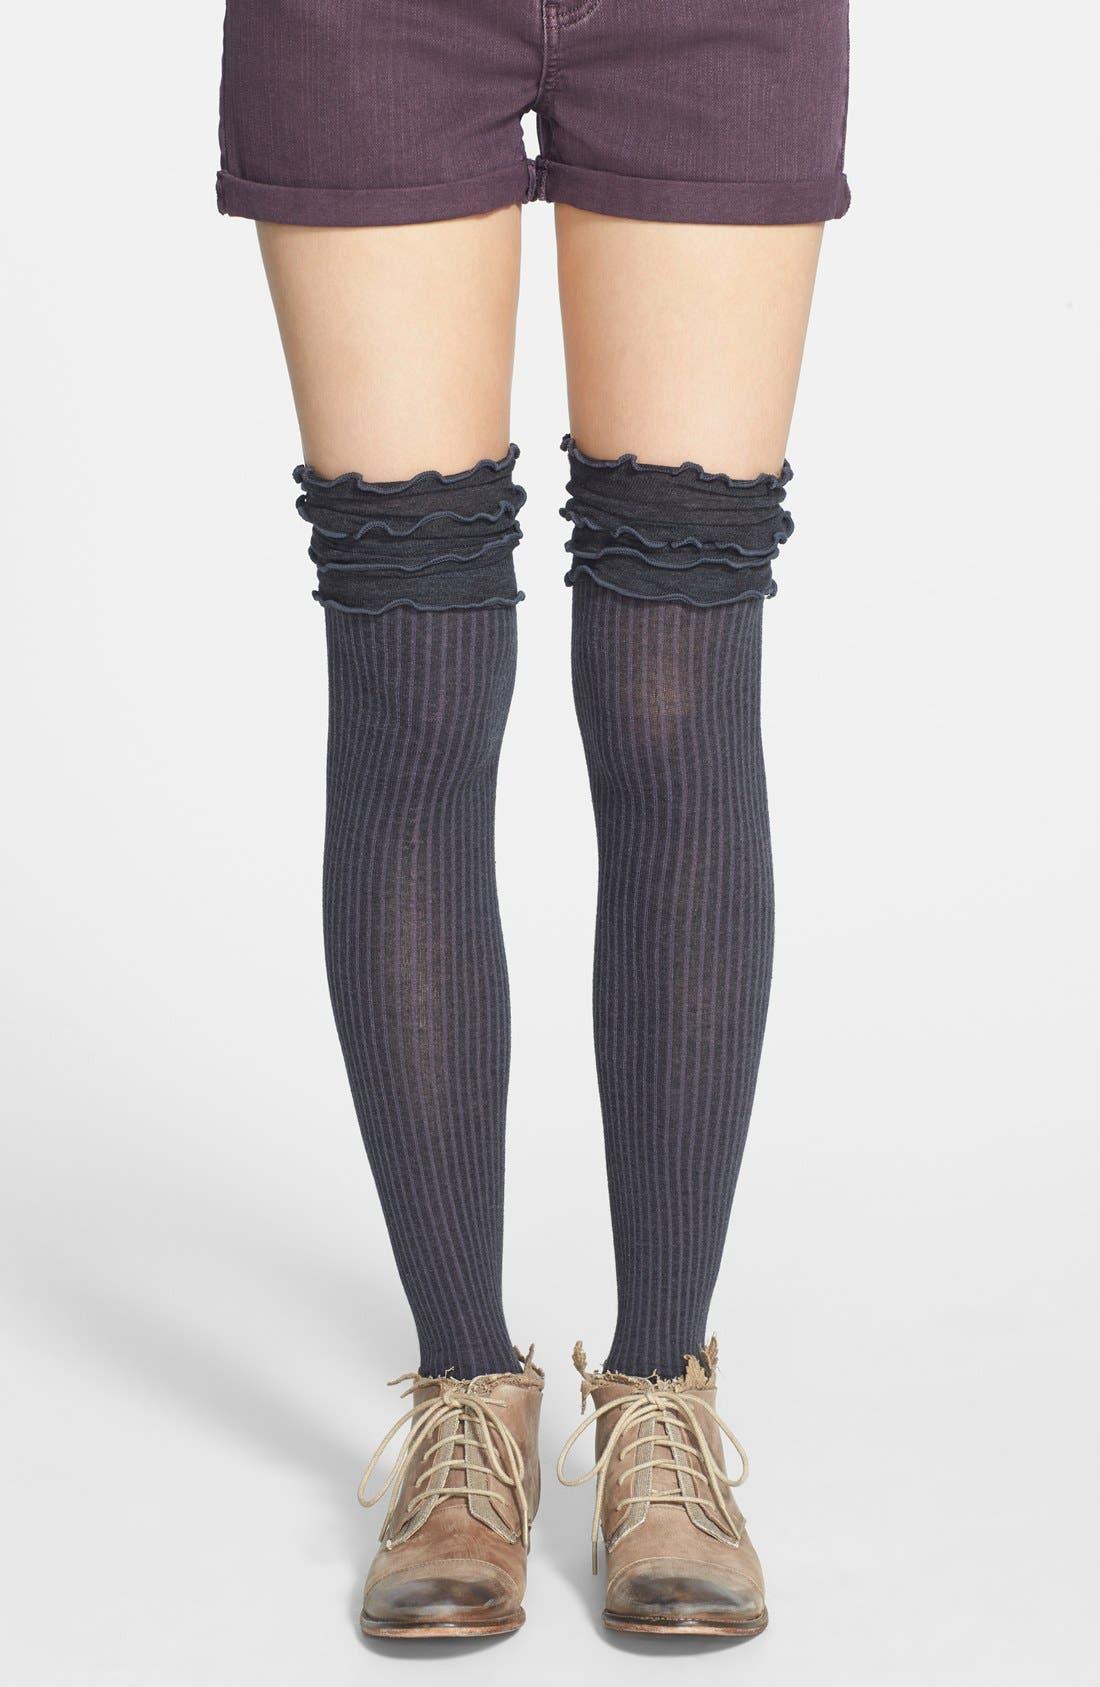 Alternate Image 1 Selected - Free People 'Fidler' Ruffled Over the Knee Socks